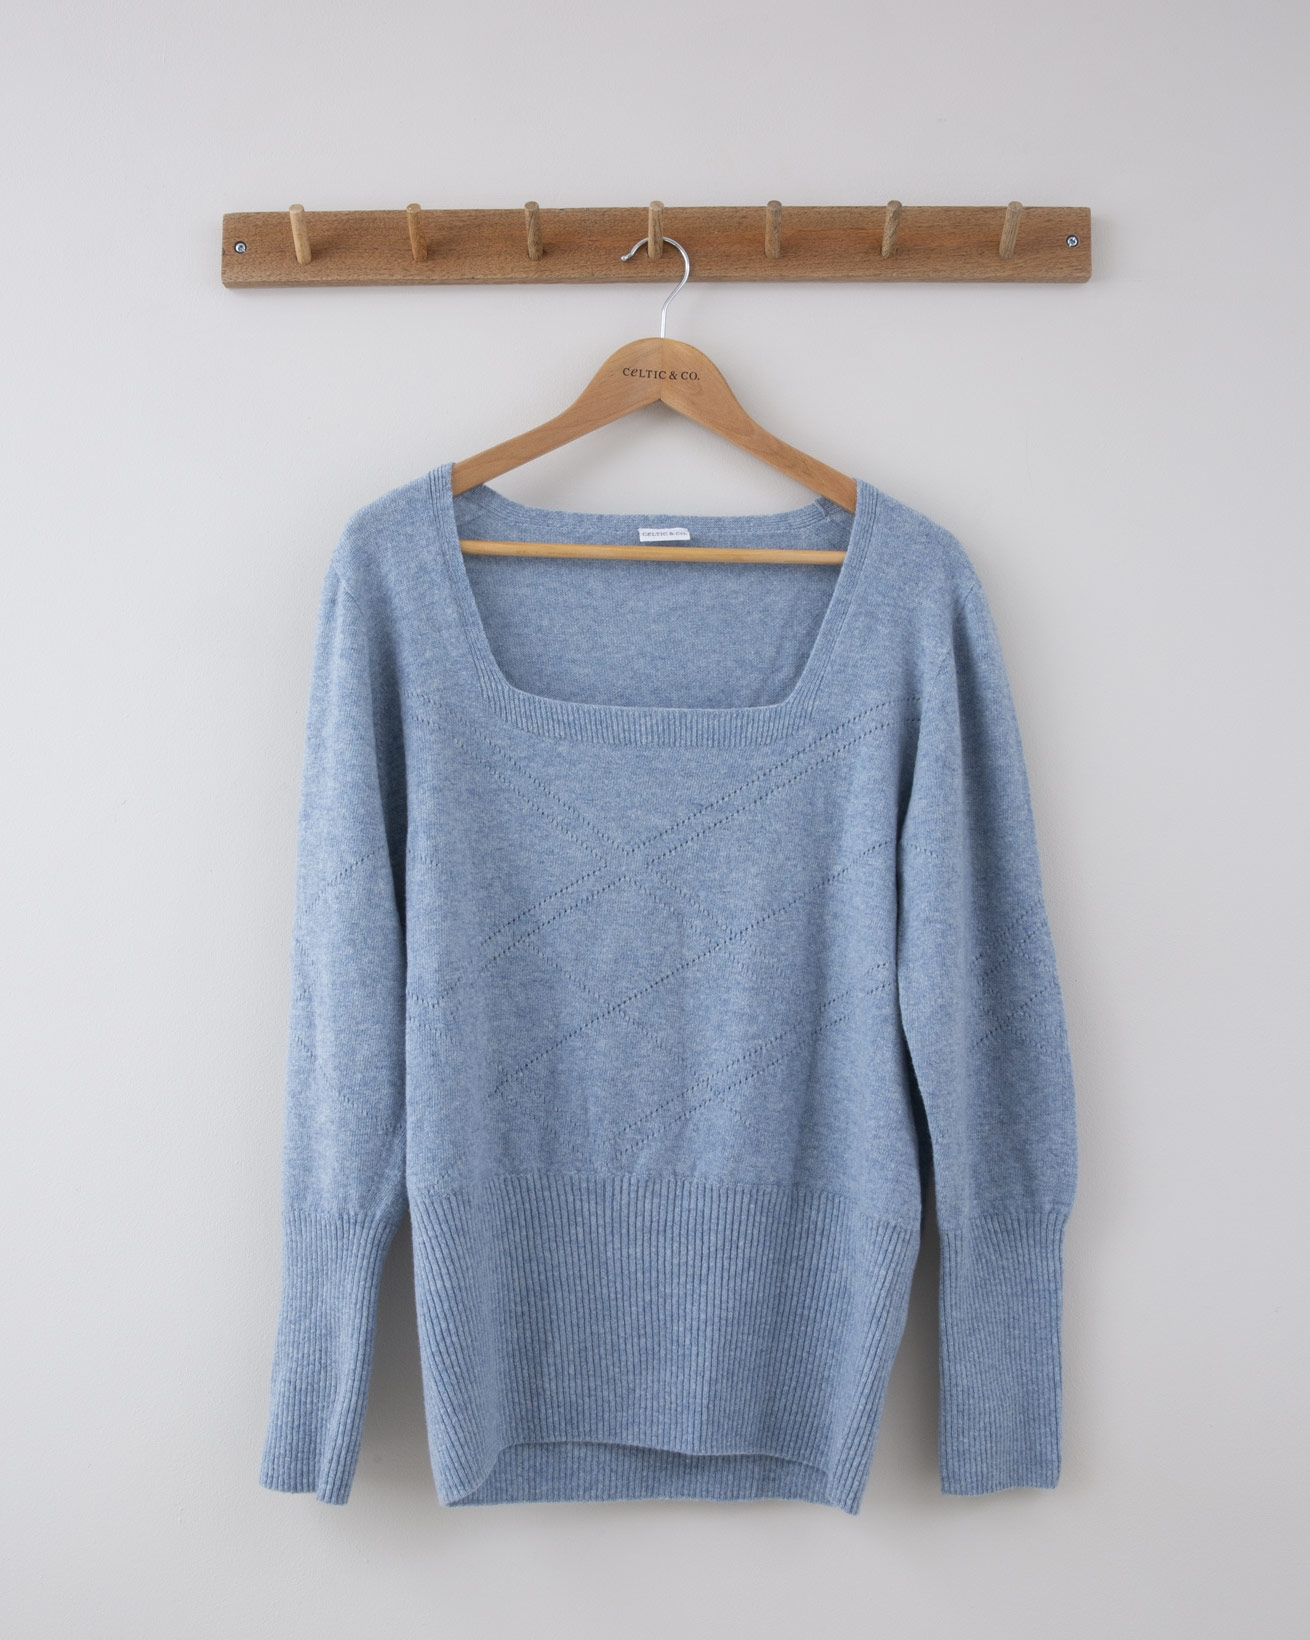 Square Neck Arglye Pointelle Jumper - Small - Denim Blue - 1284